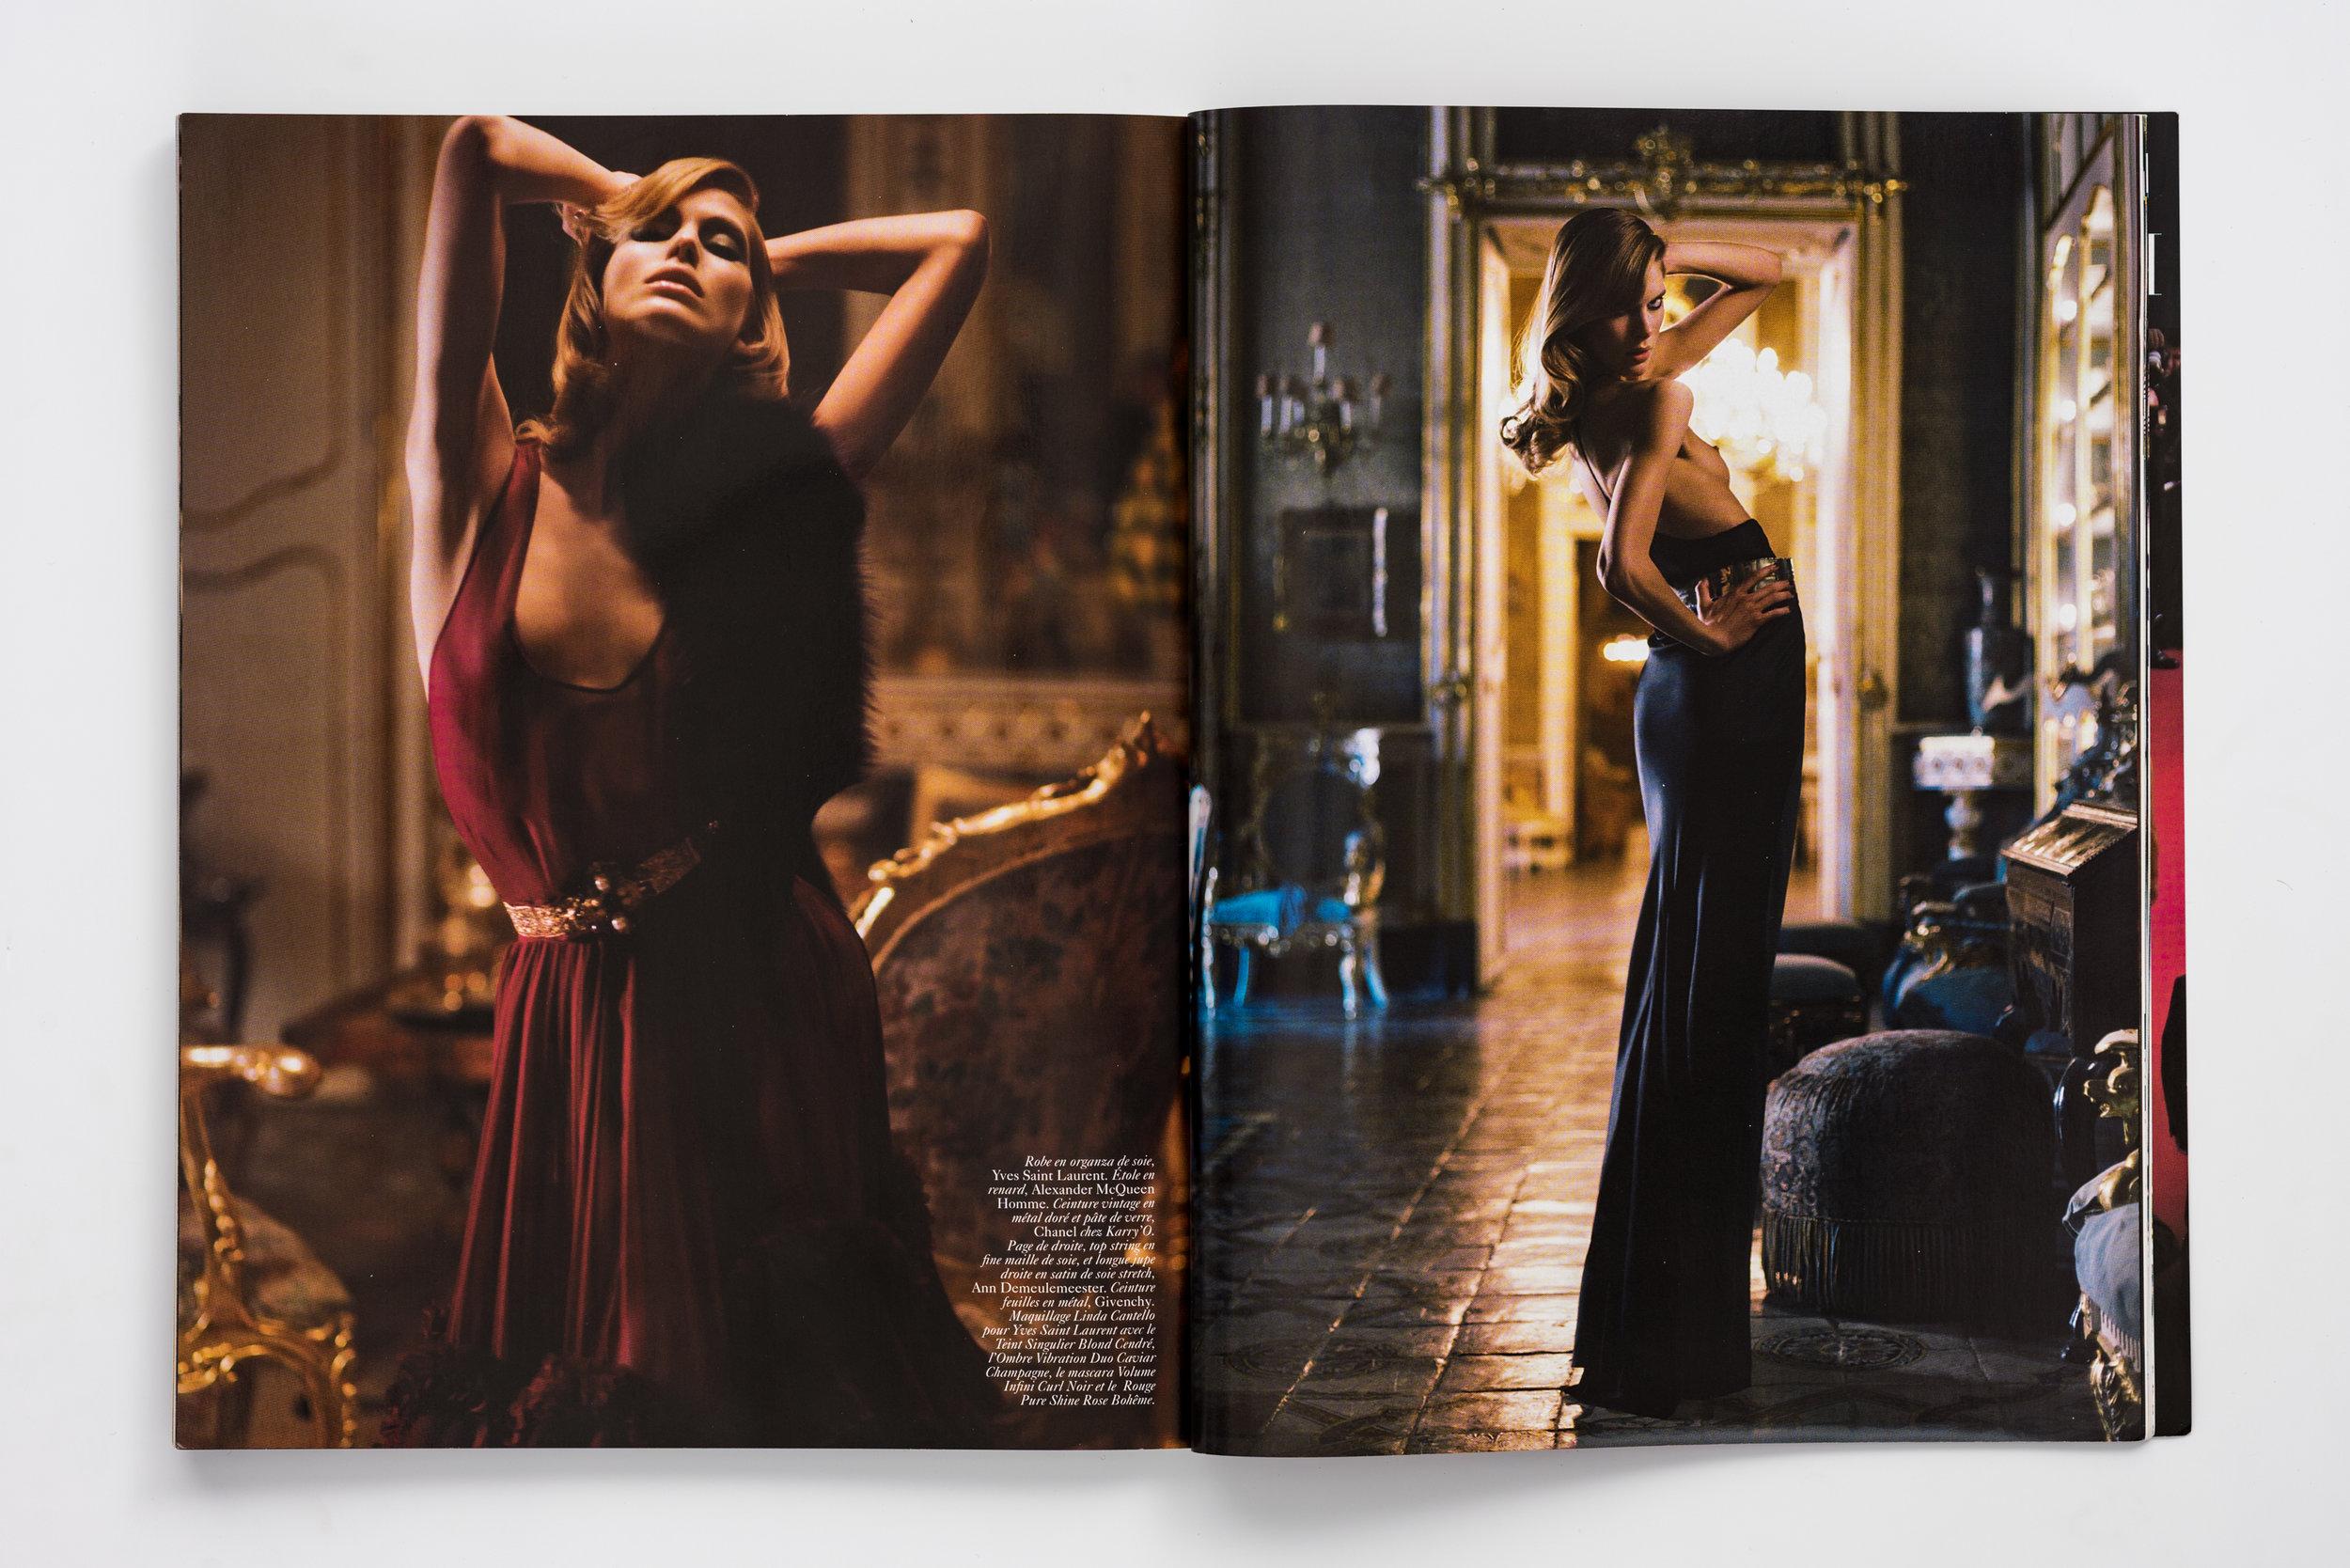 Iselin Steiro_Mario Sorrenti_Vogue Paris_Nuit Fauve_4.jpg